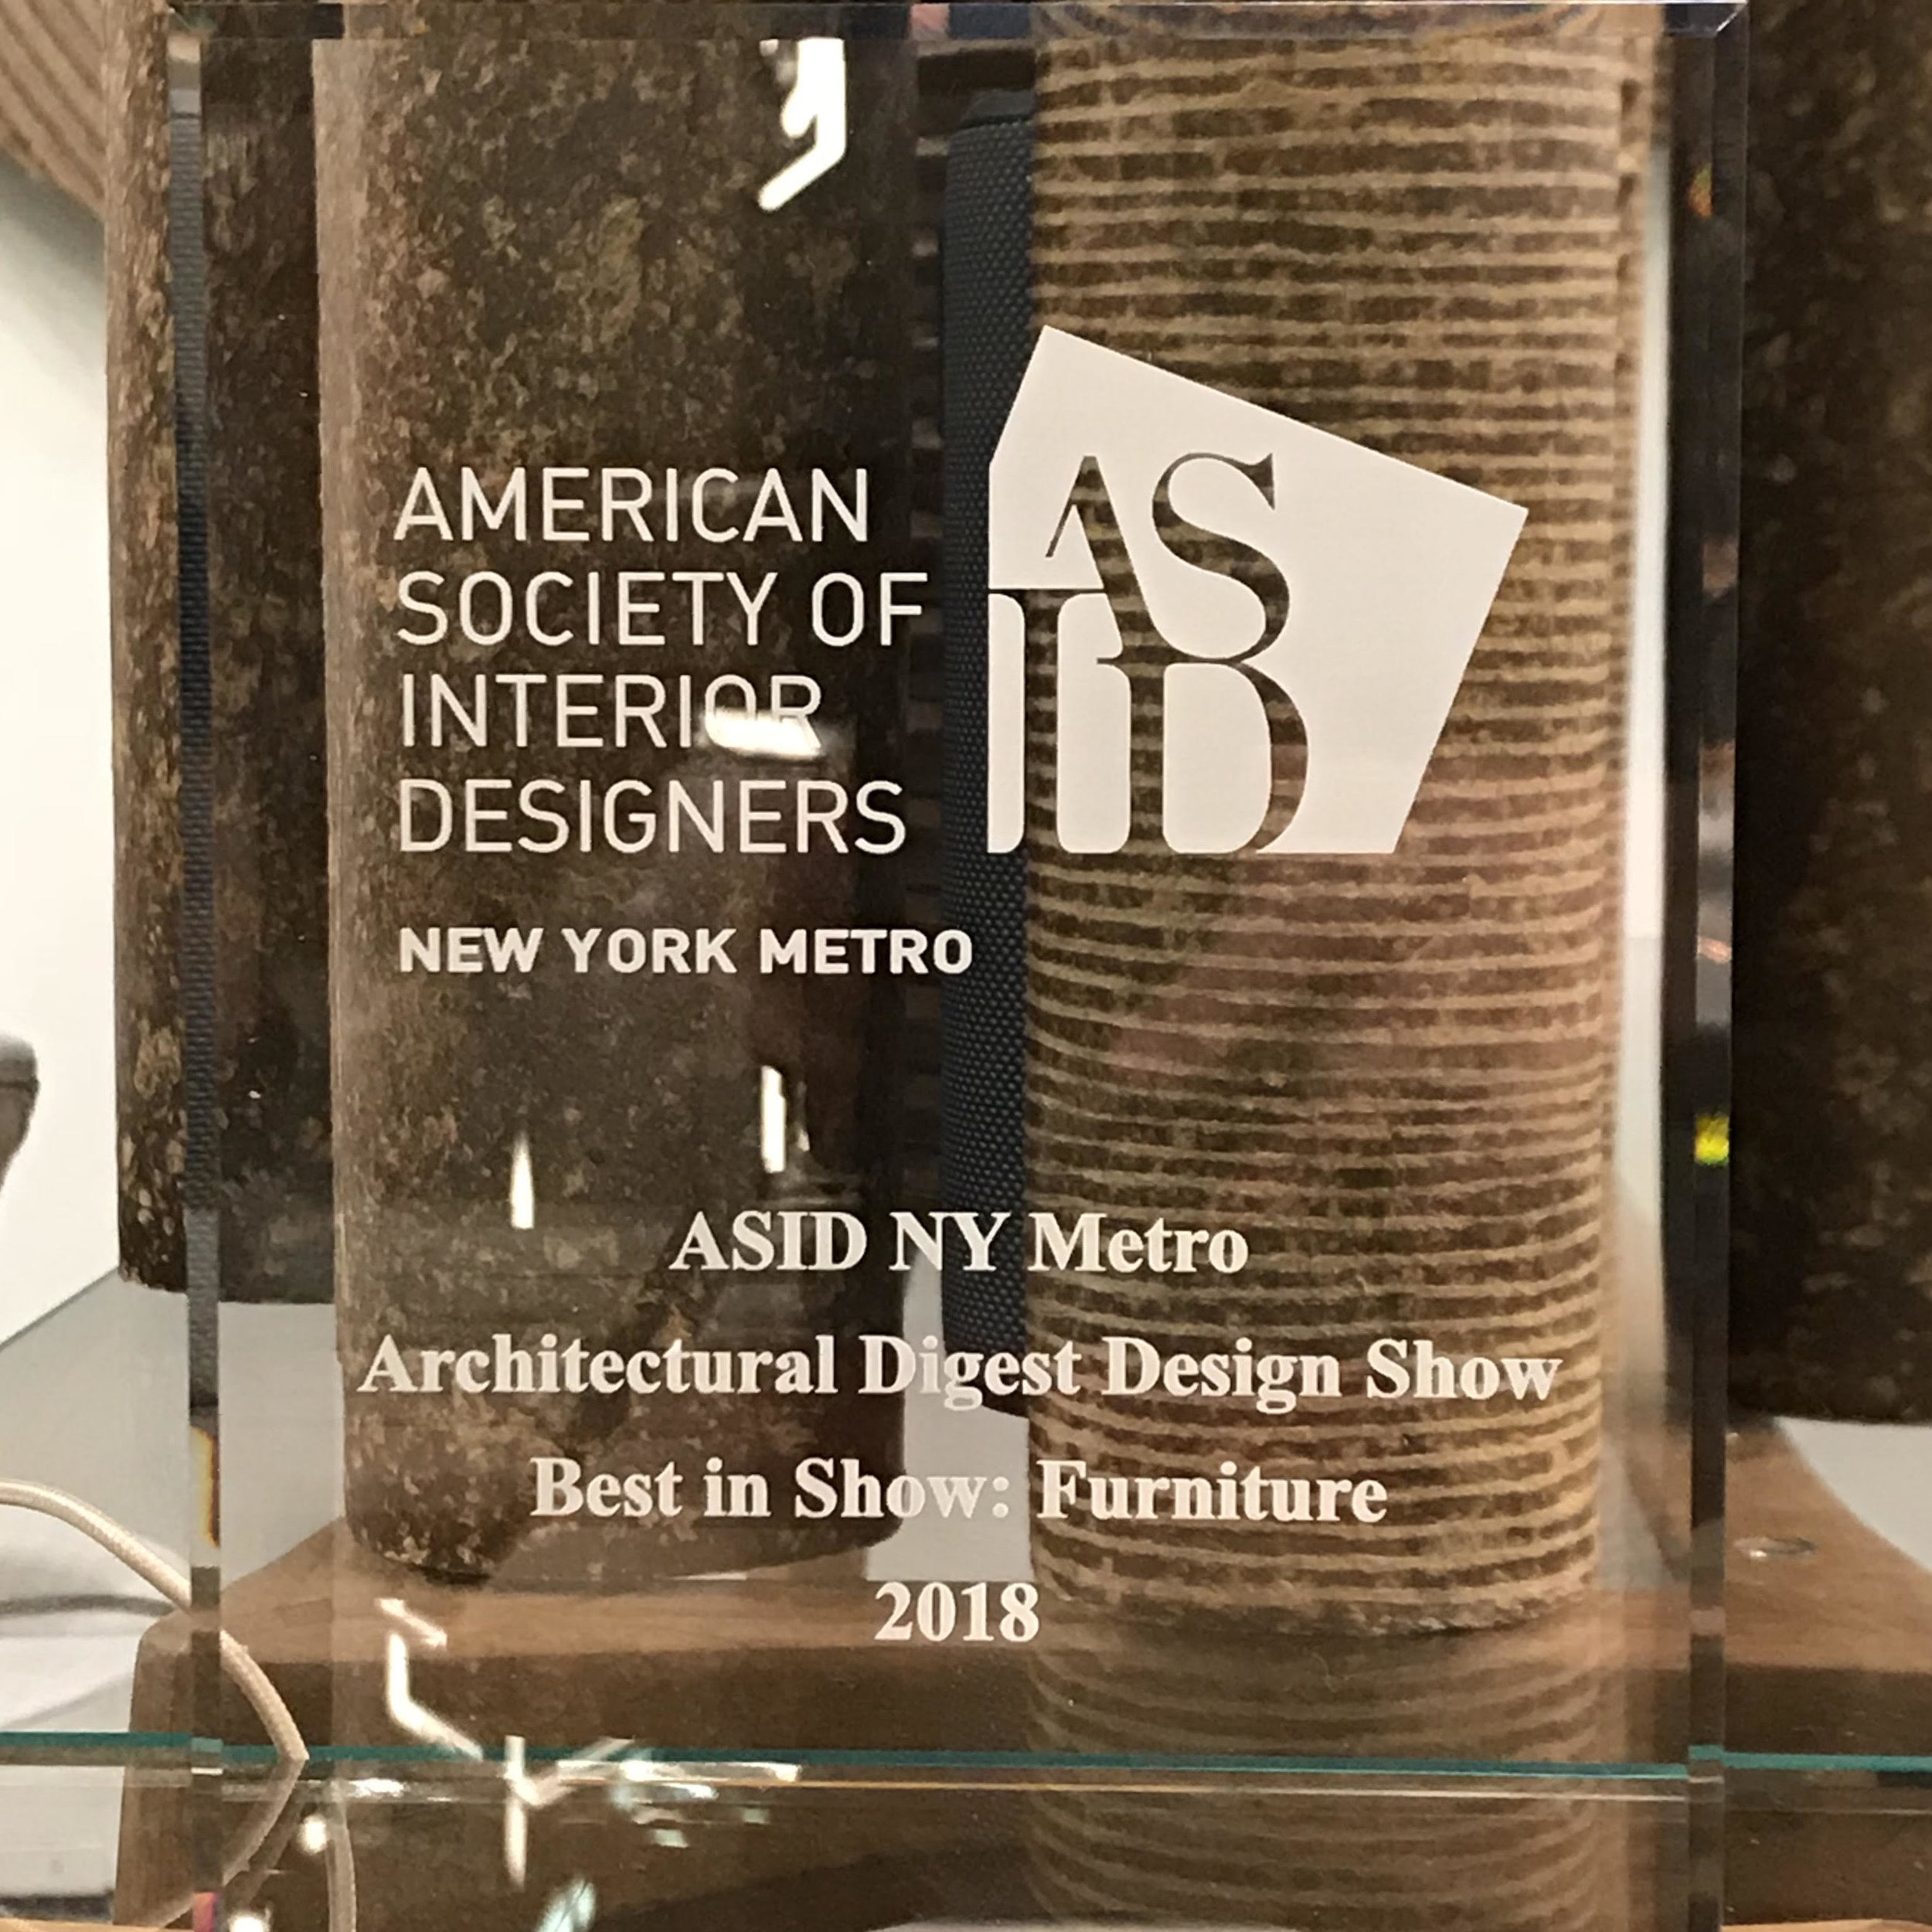 ASID Award.jpg